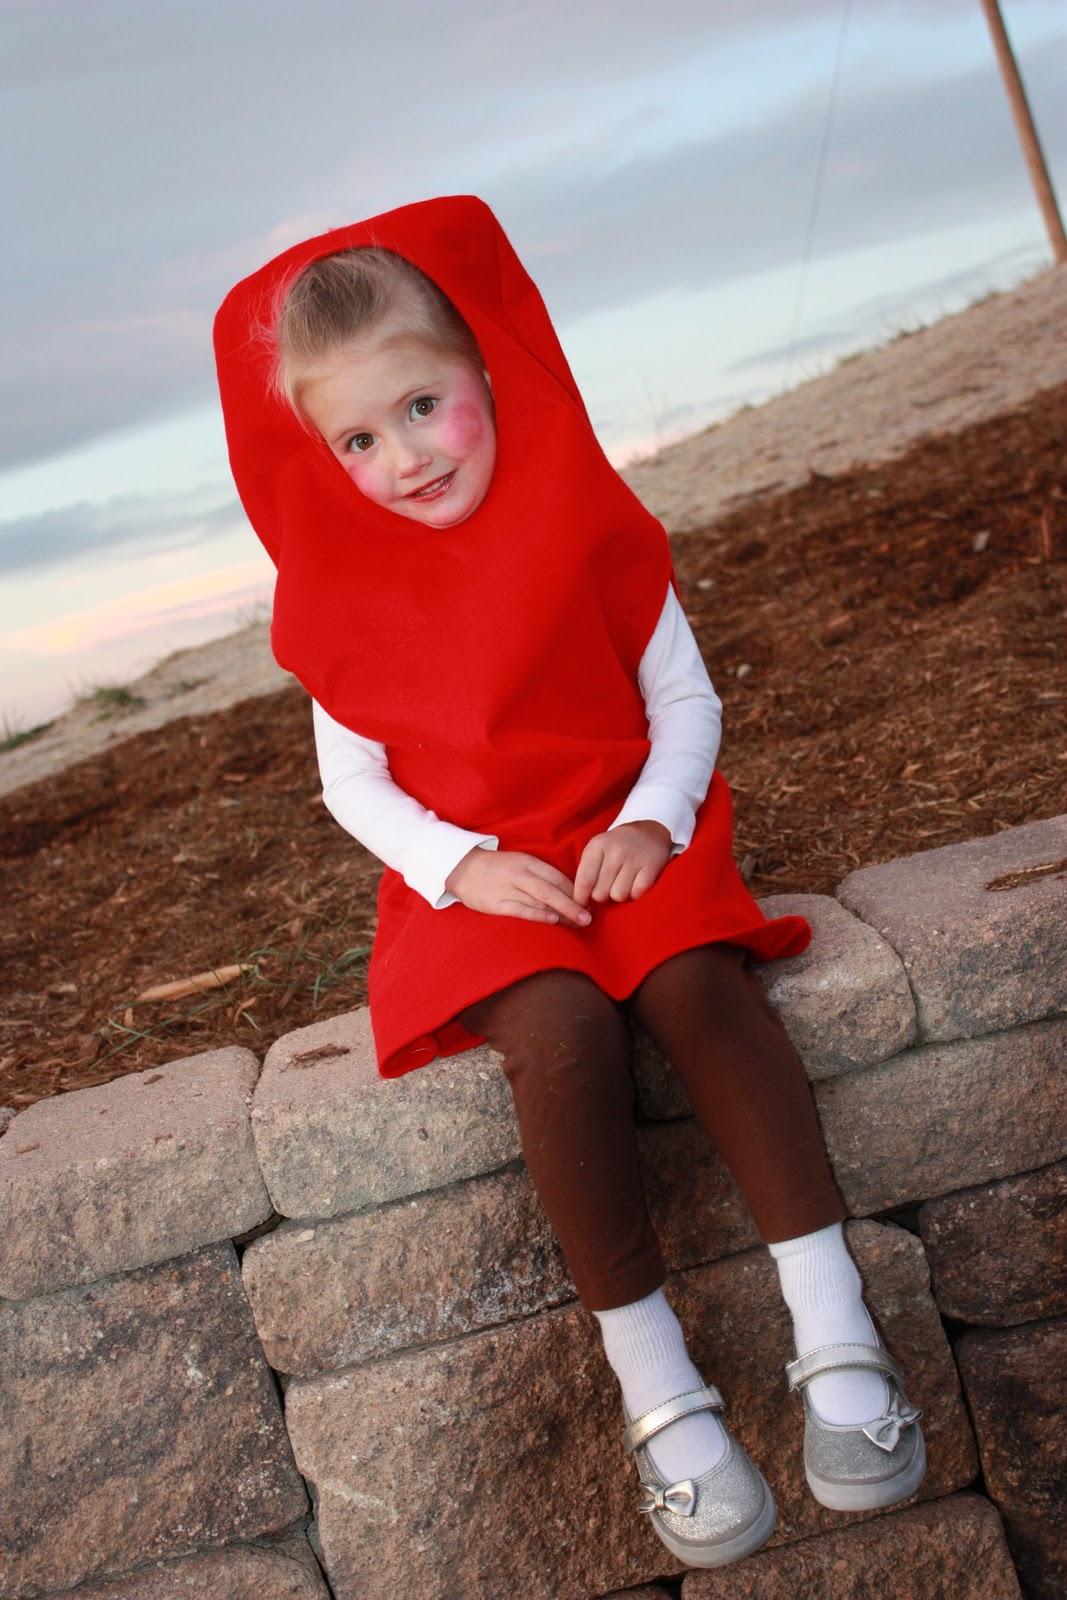 Jujub Cherry Red Popsicle Halloween Costume Tutorial